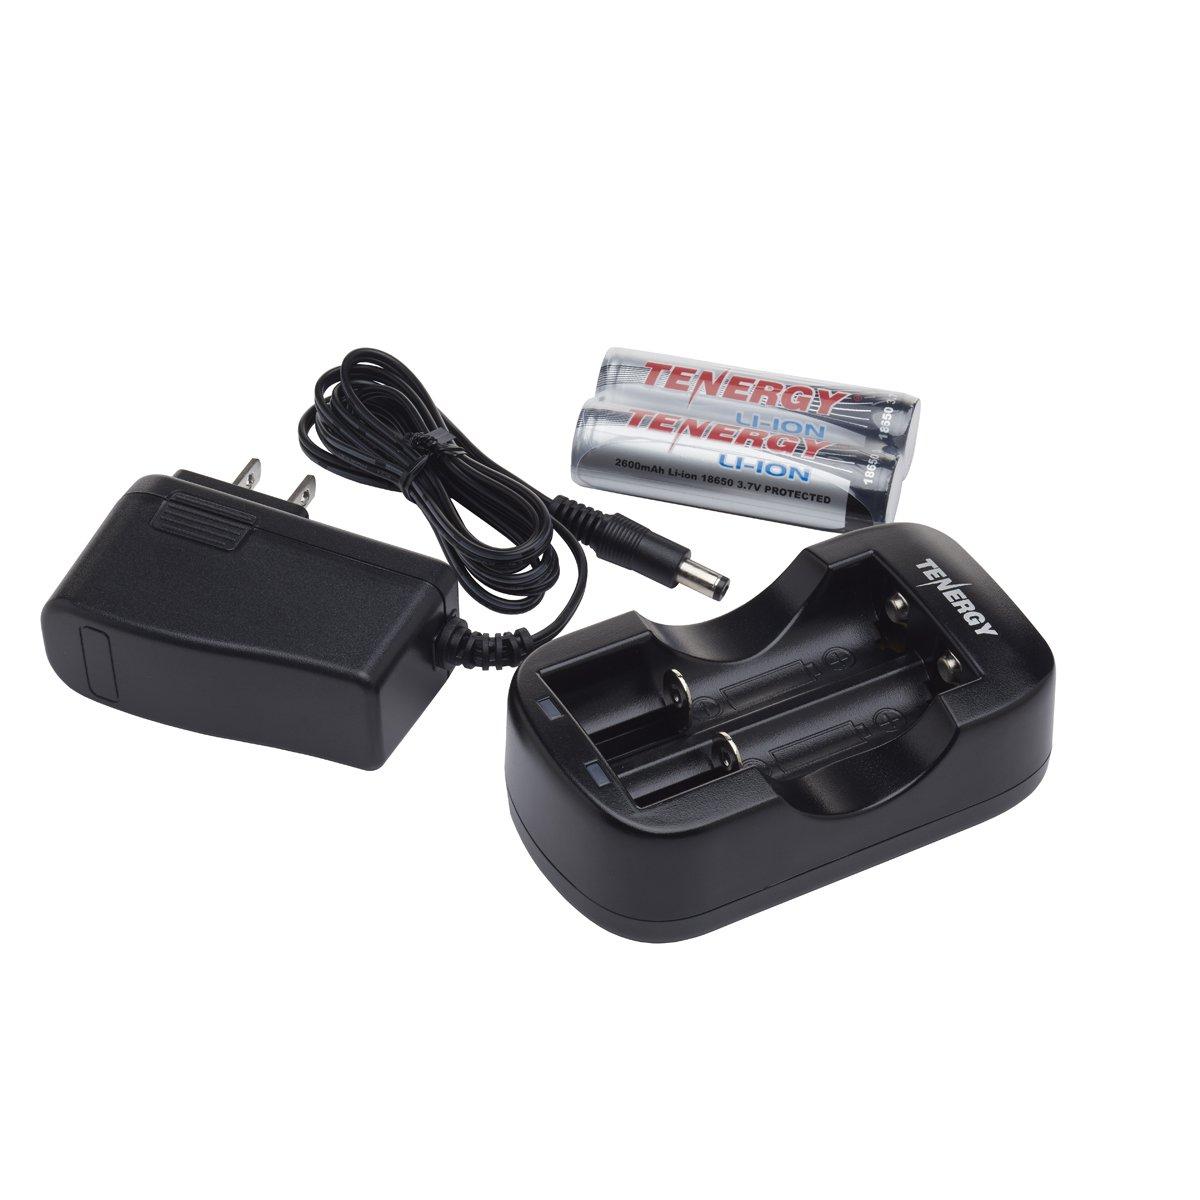 Nova 720 Charger Kit w/dual batteries